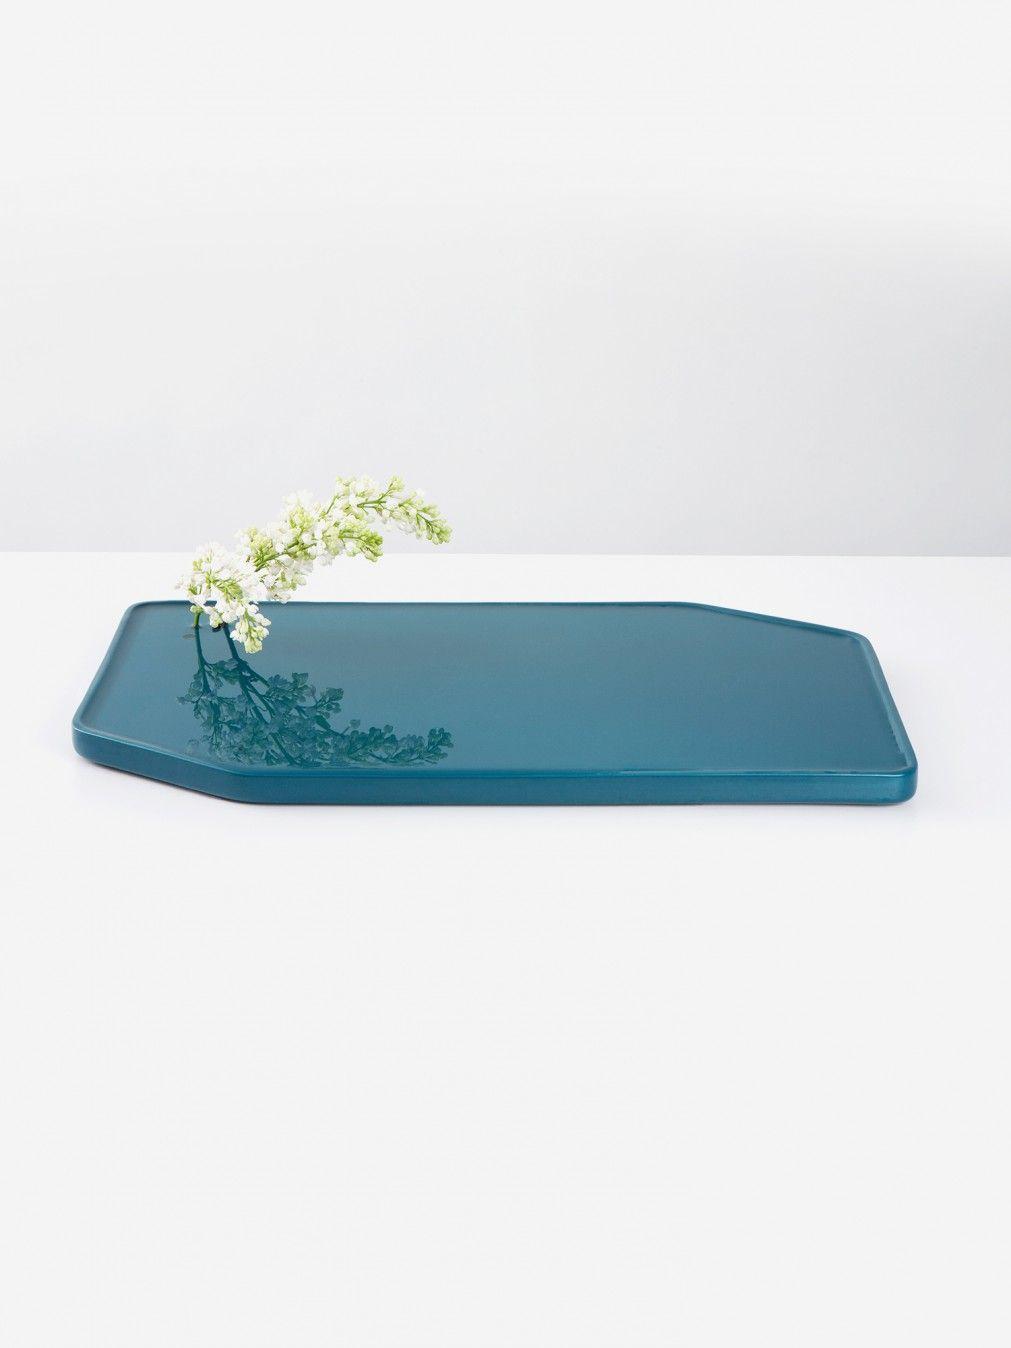 Plan ceramic vase - Moustache